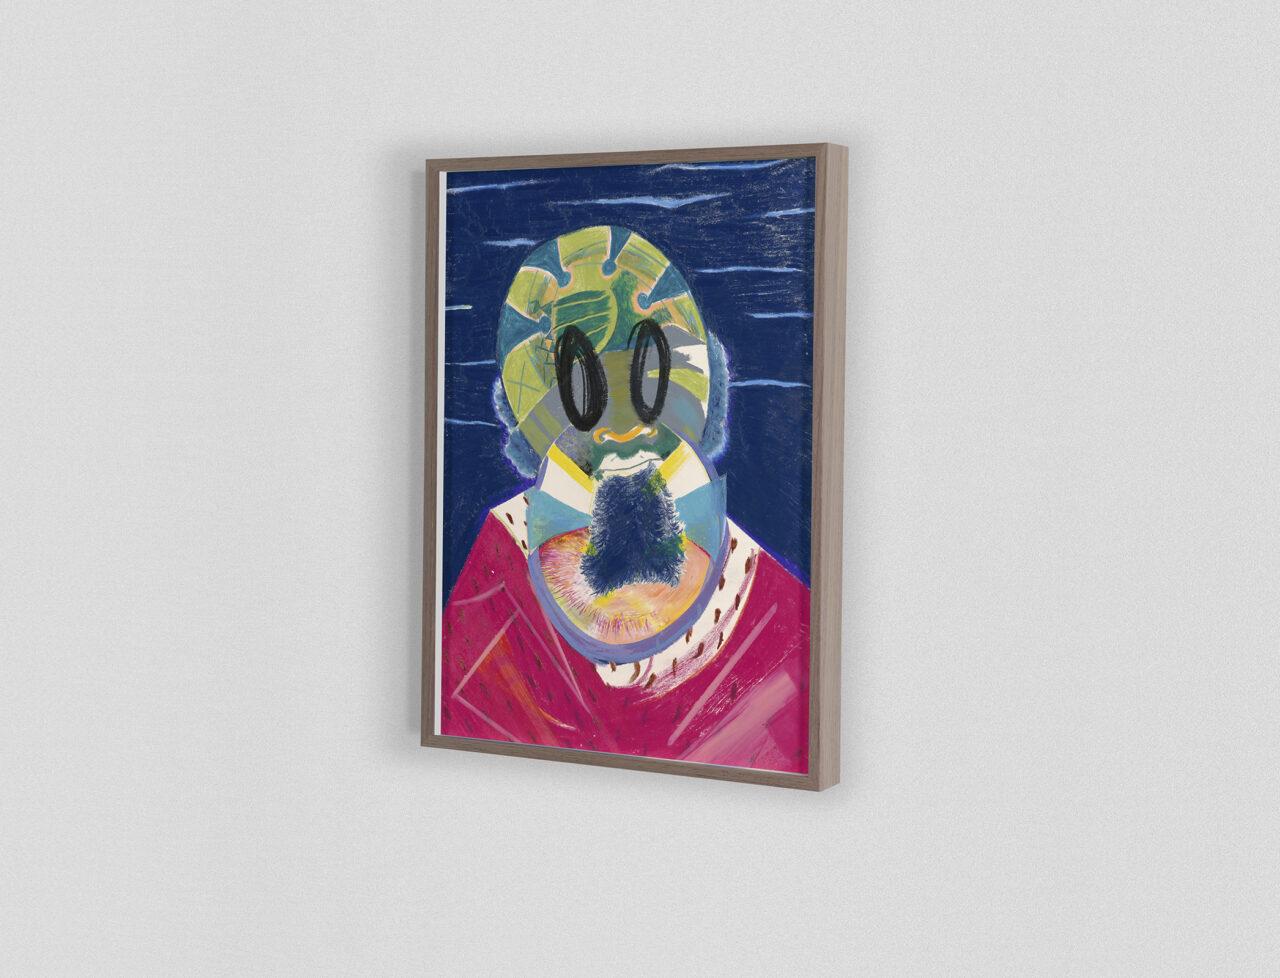 Icon #036 2020 | 40,5 x 29,8 cm. Mixed media on paper